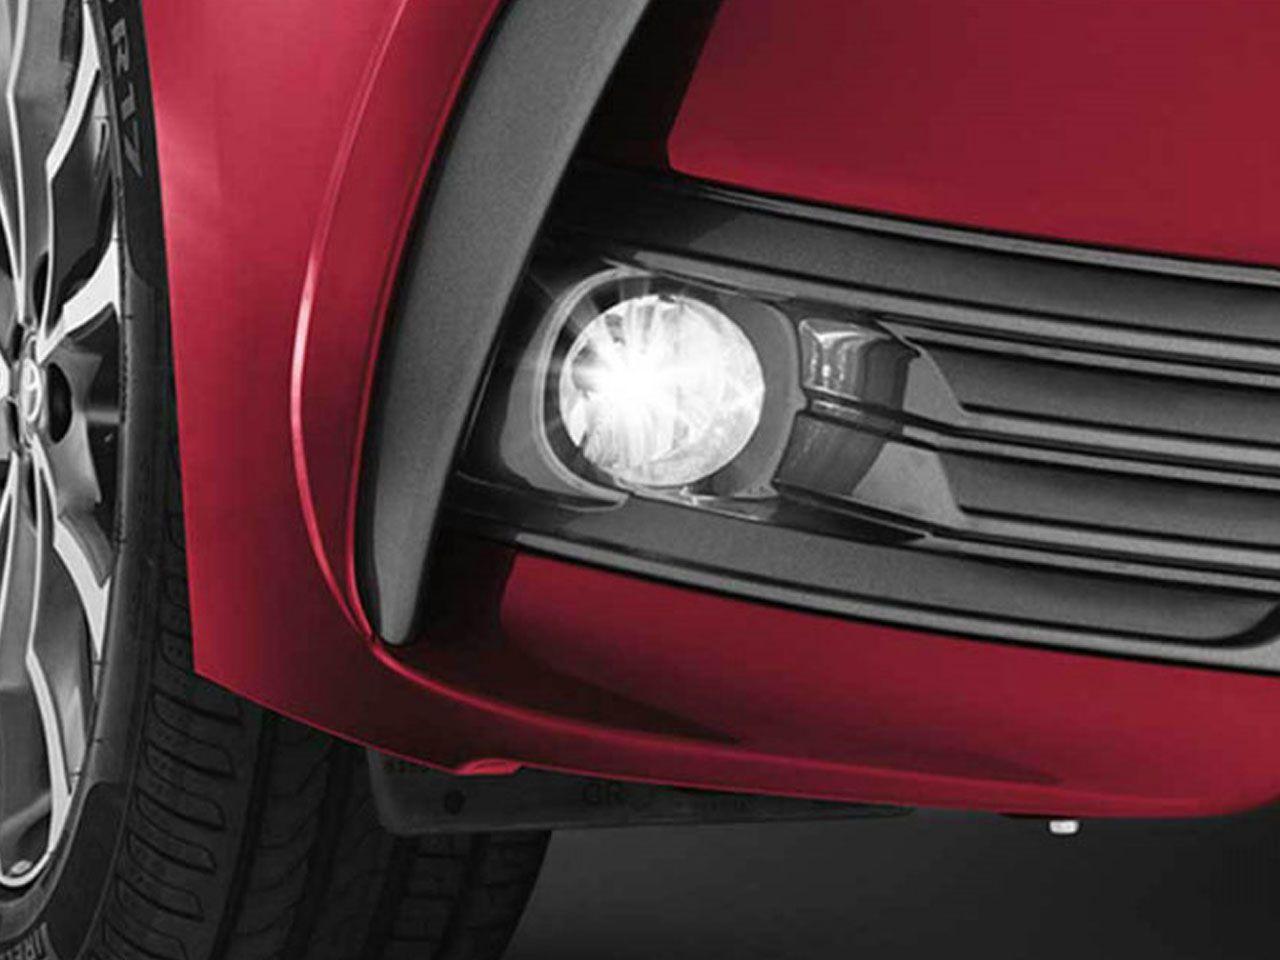 Kit de Lâmpadas de Luz Branca em LED para Faróis de Neblina Corolla XEi XRS ALTIS 2014 a 2019  - Mirai Peças Toyota